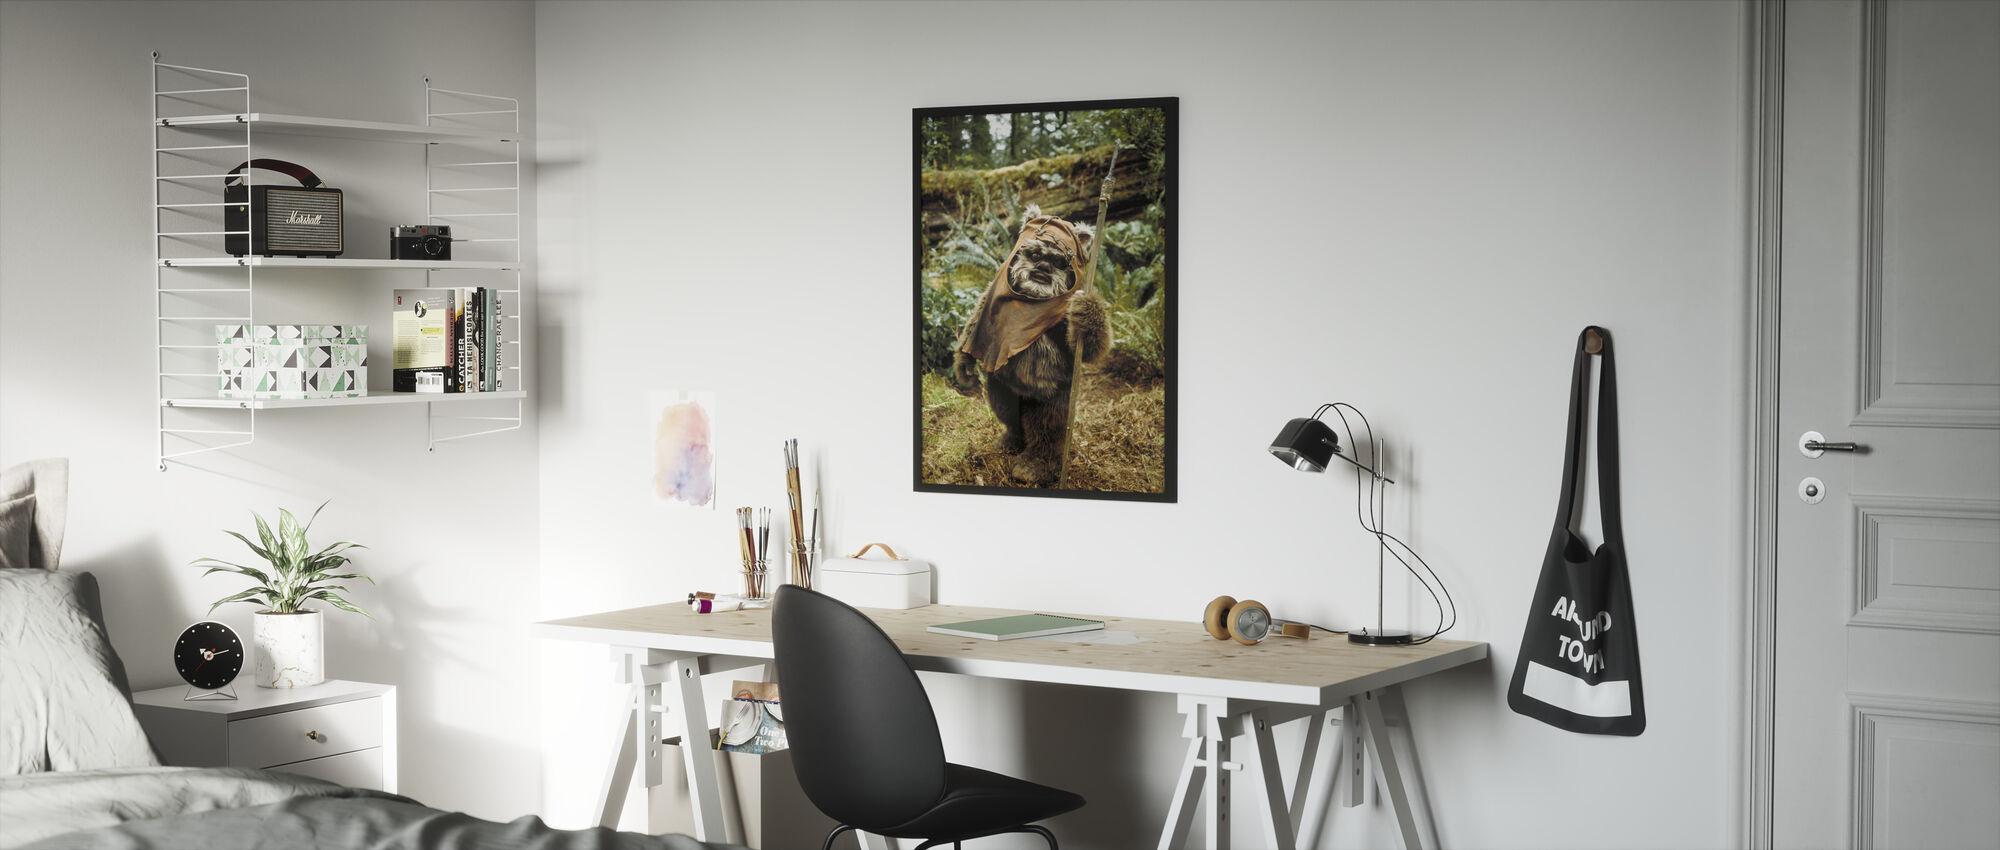 Star Wars - Ewok Wicket - Kehystetty kuva - Lastenhuone